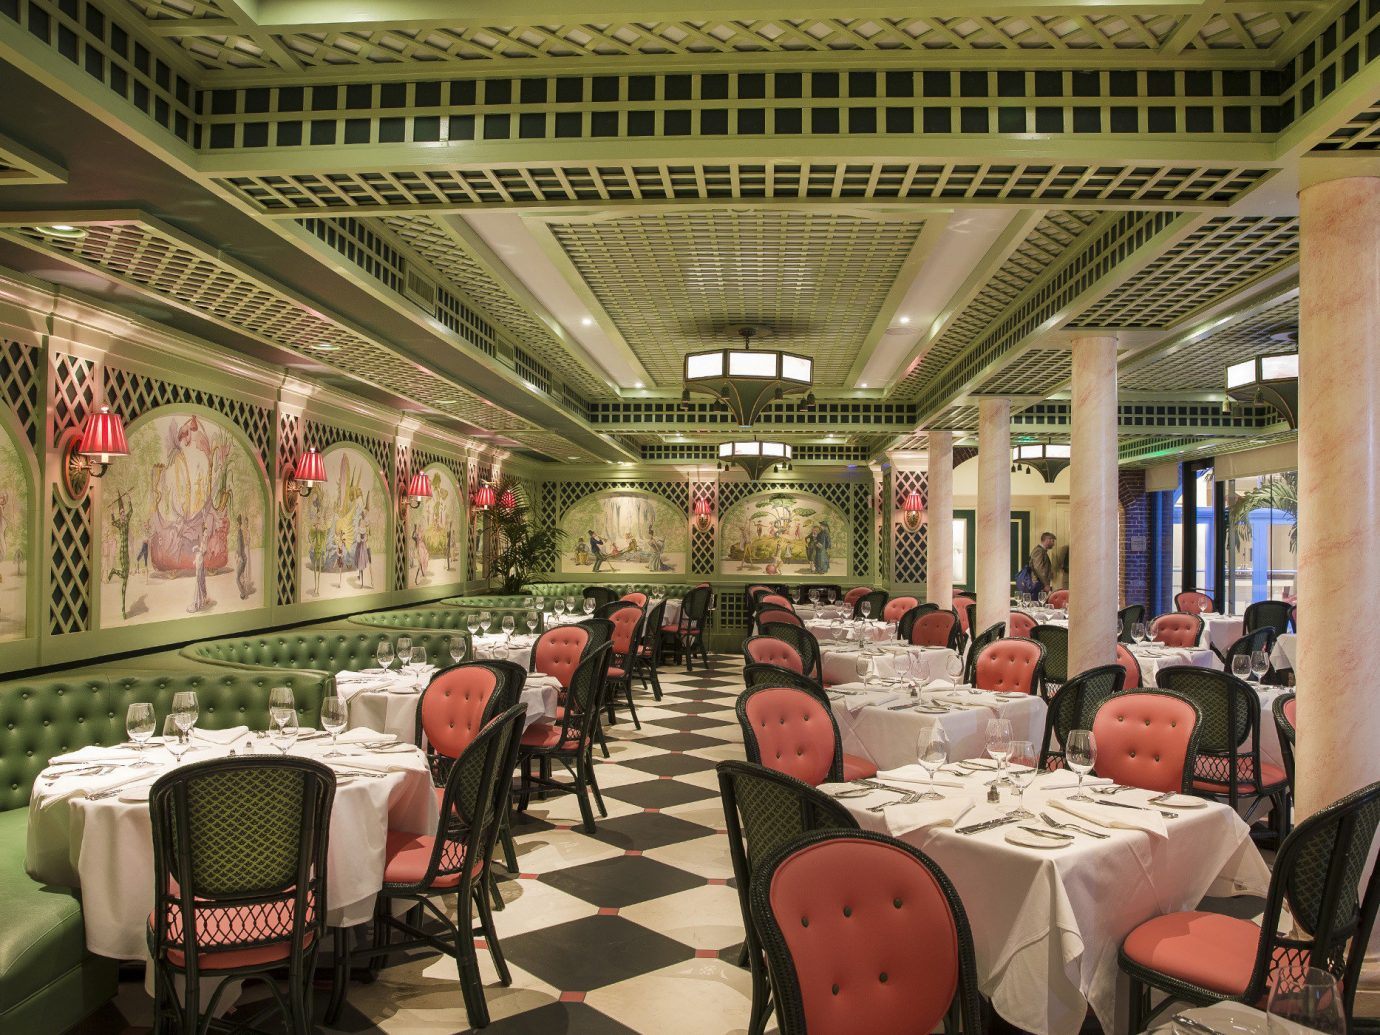 Food + Drink indoor ceiling meal restaurant interior design